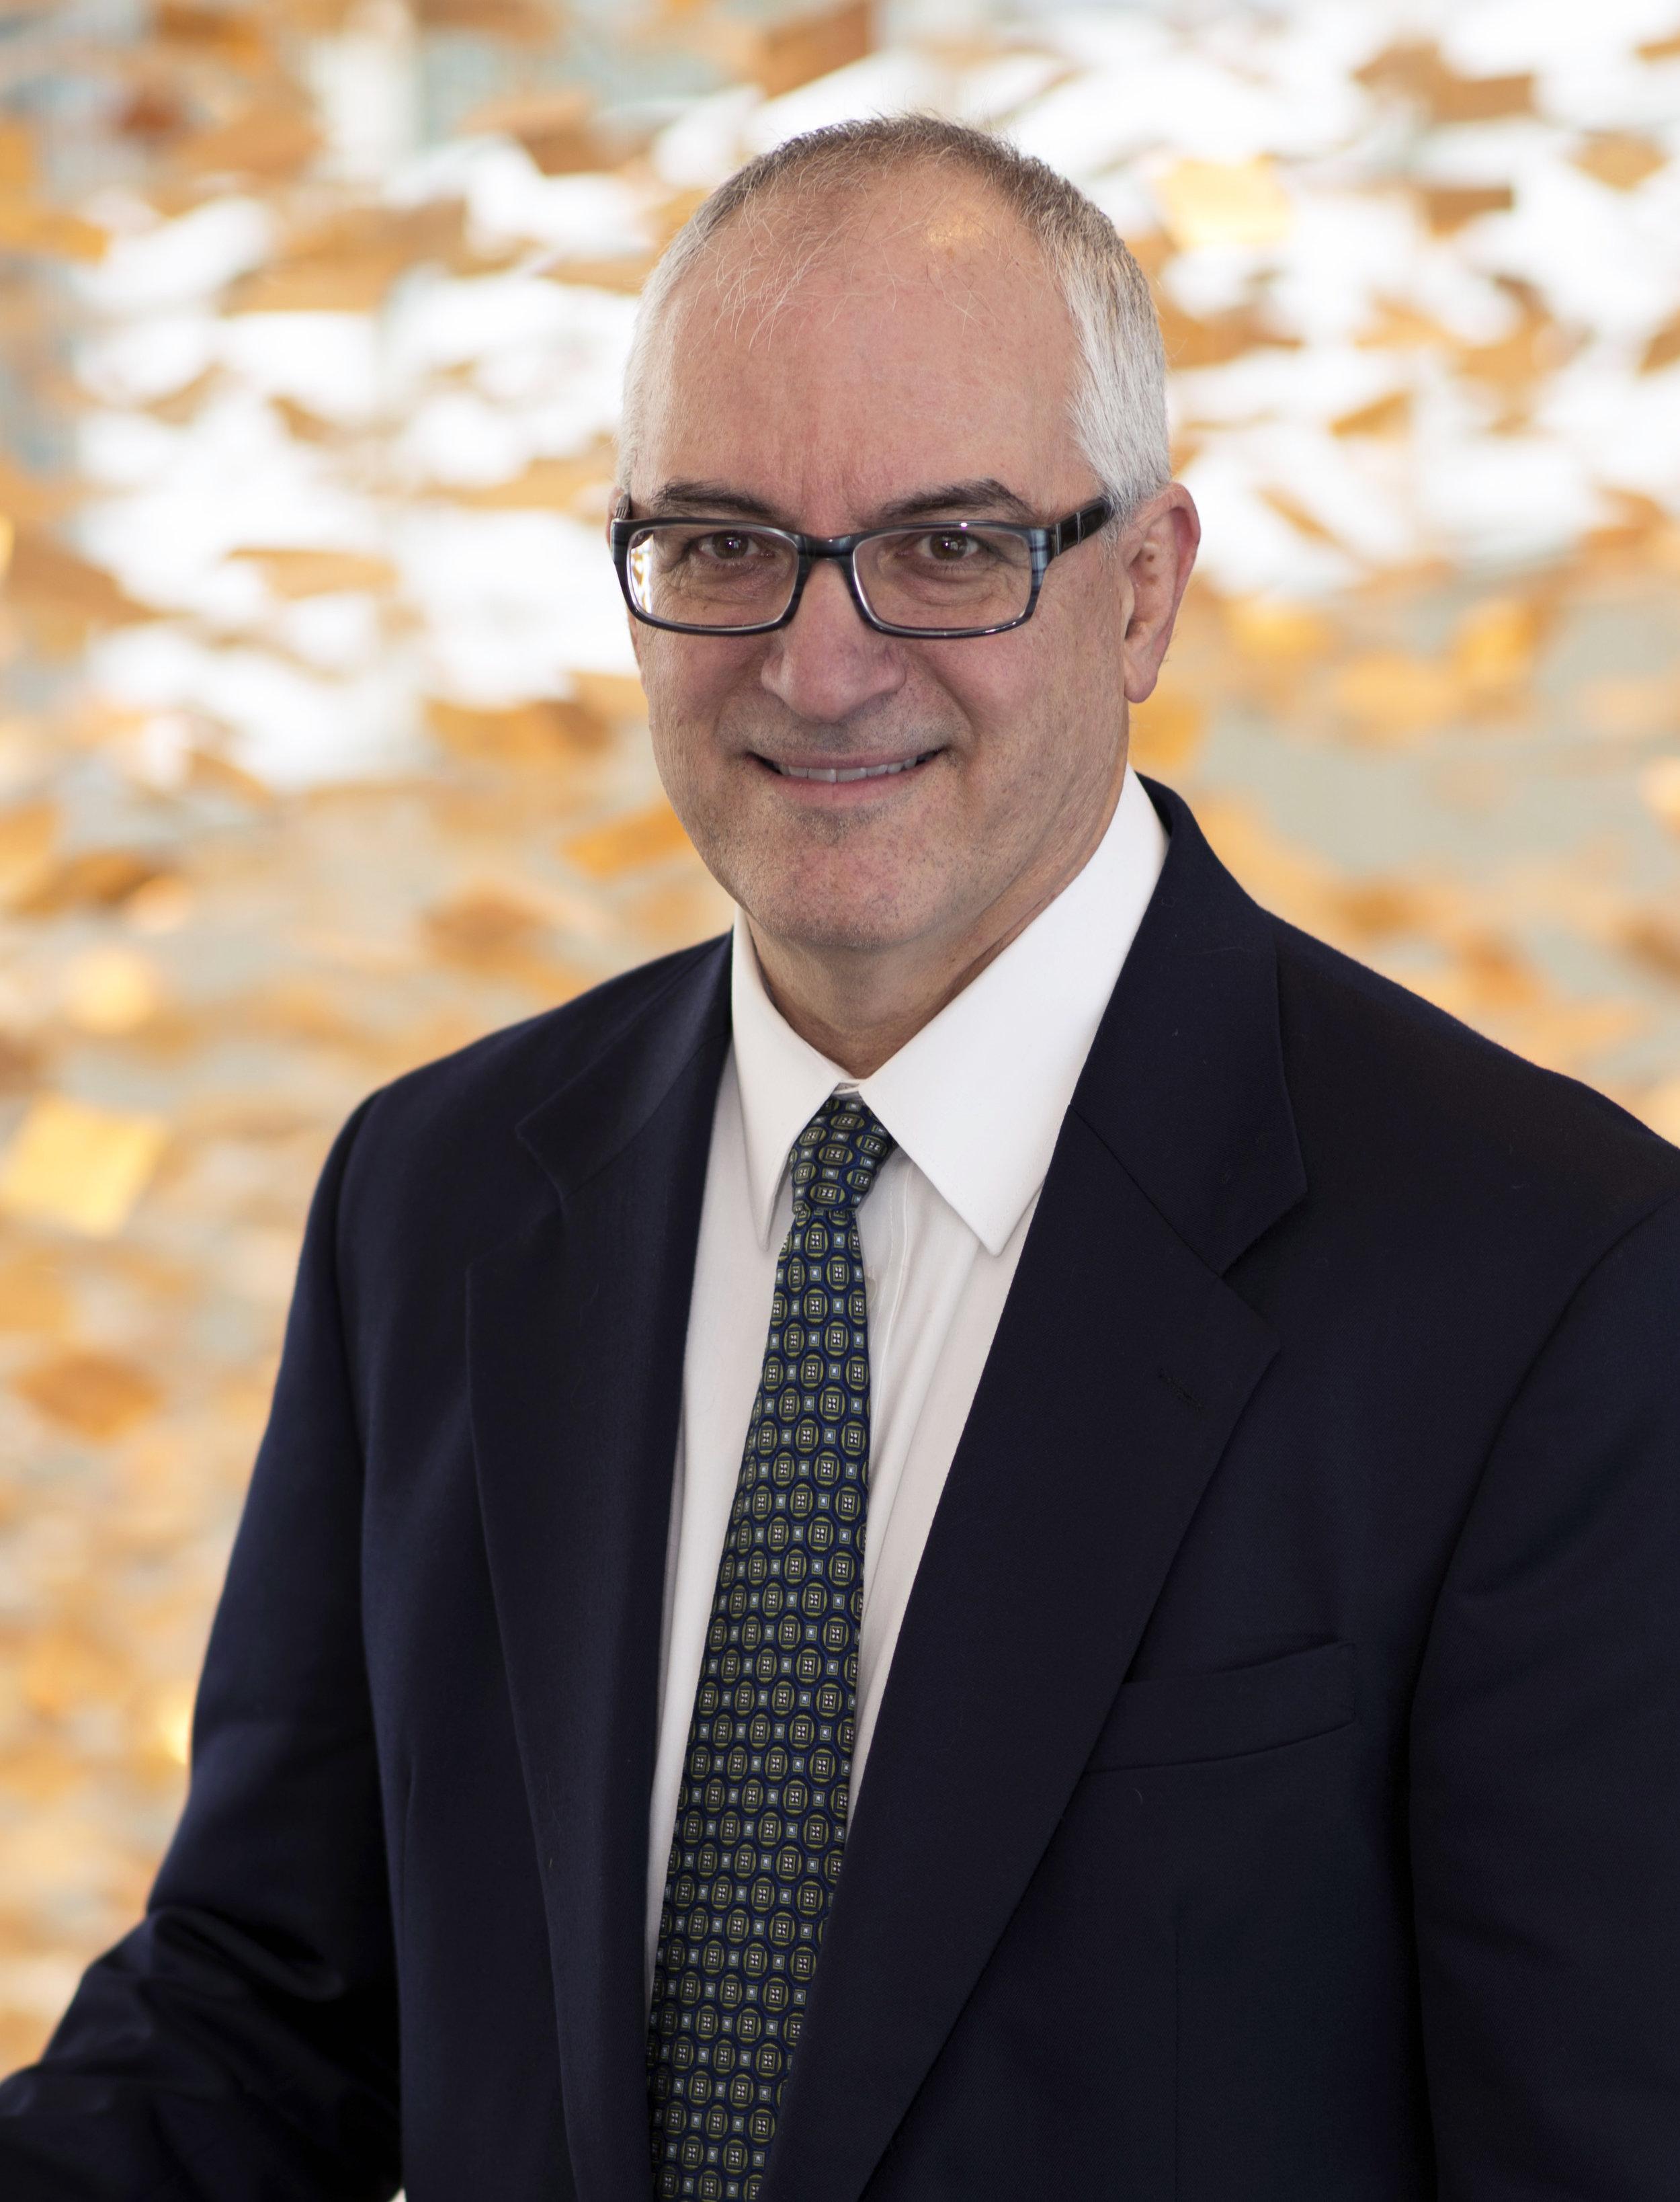 Kevin Jurek, Owner, Organizational Improvement Solutions LLC